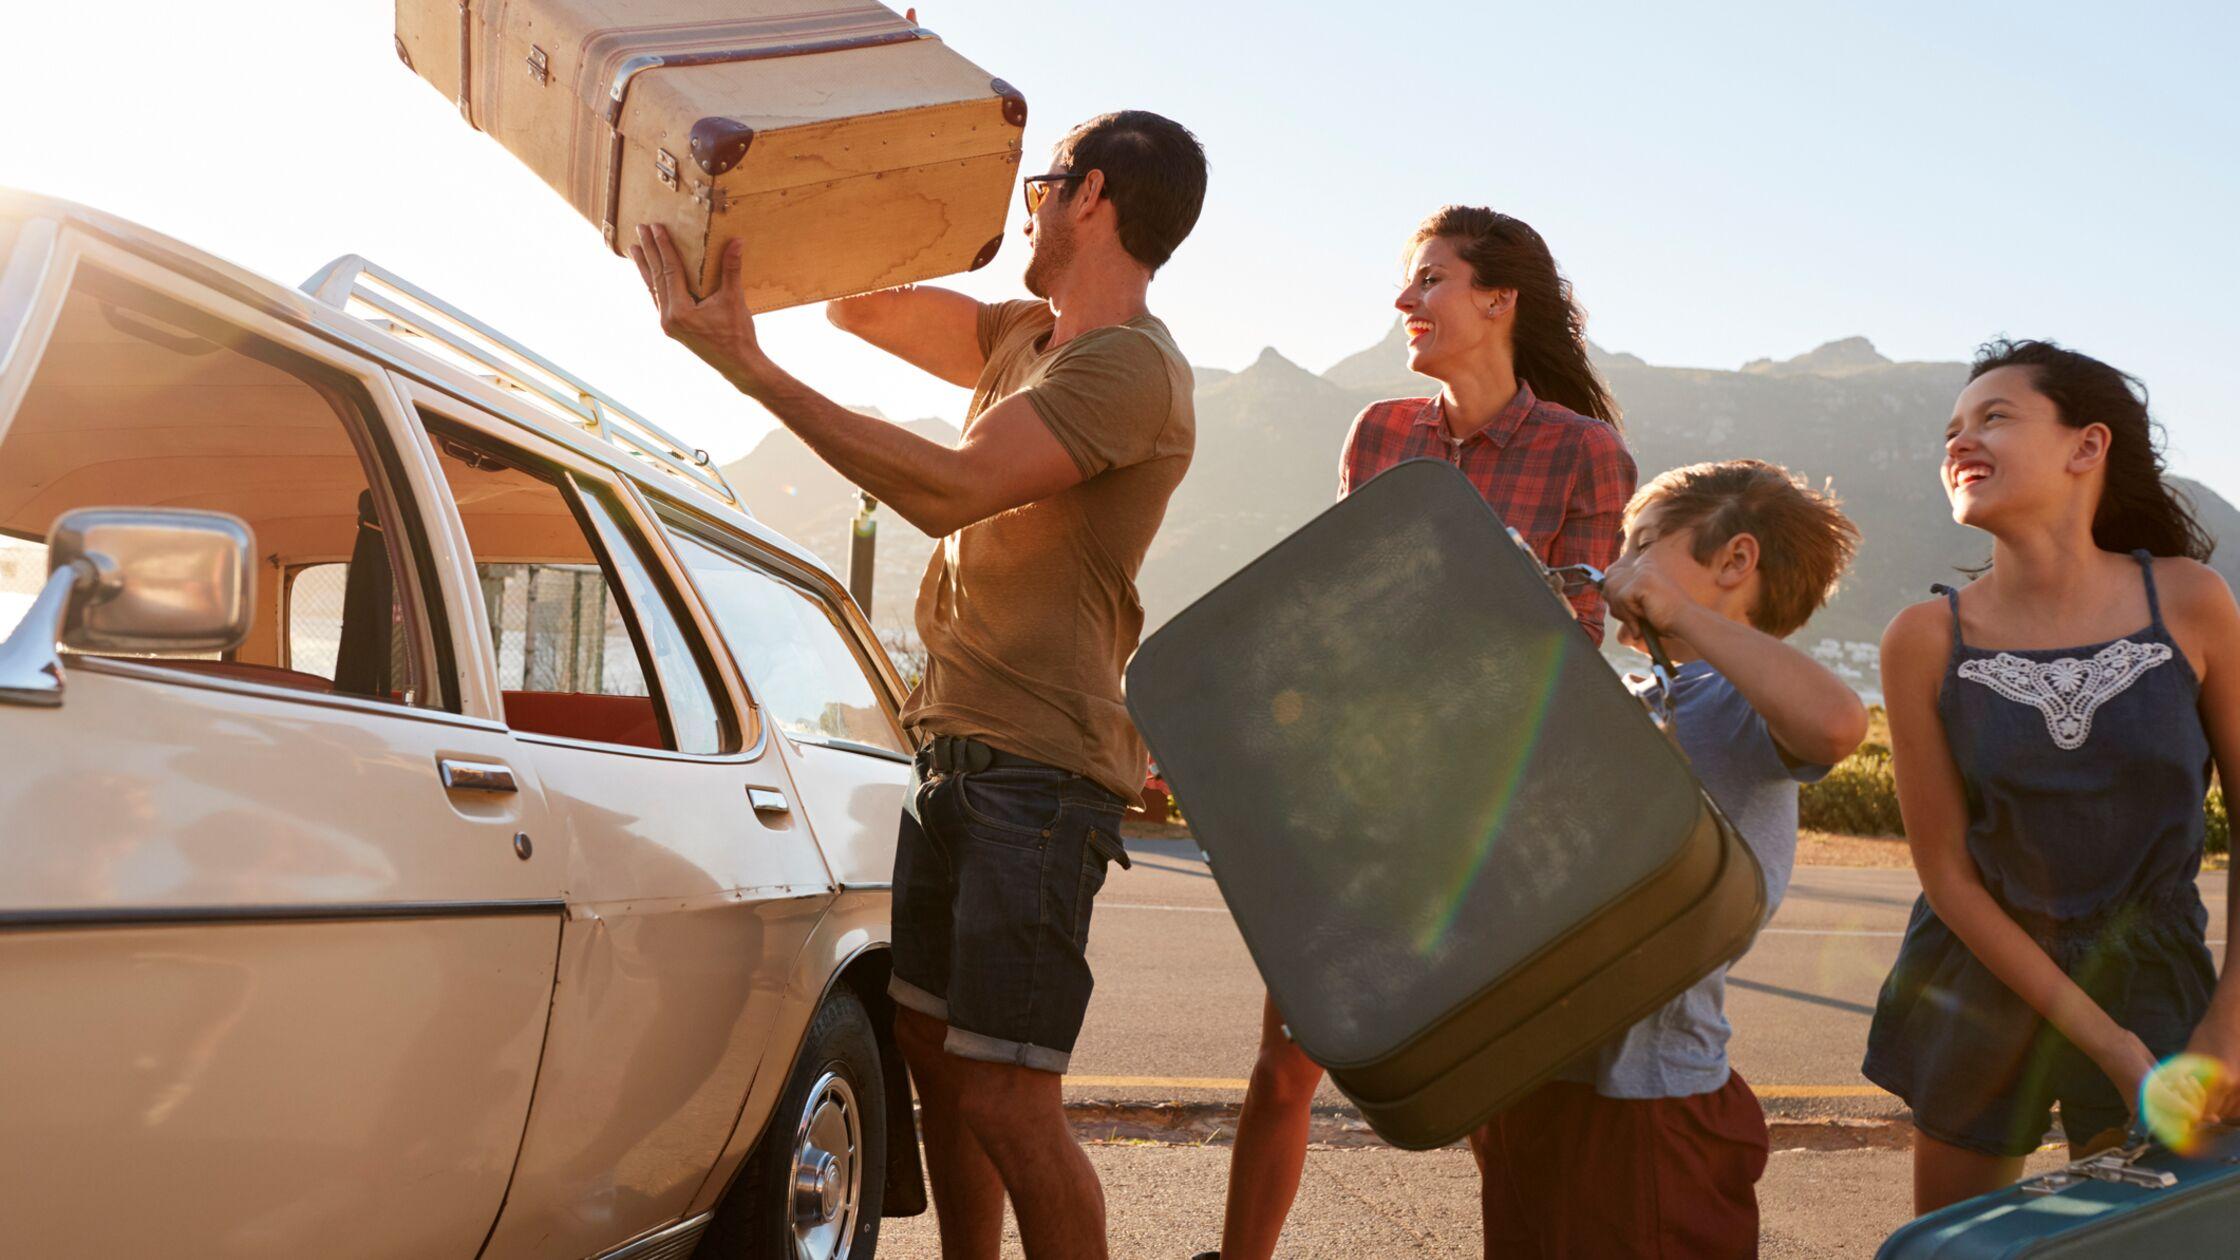 Familie lädt Koffer ins Auto